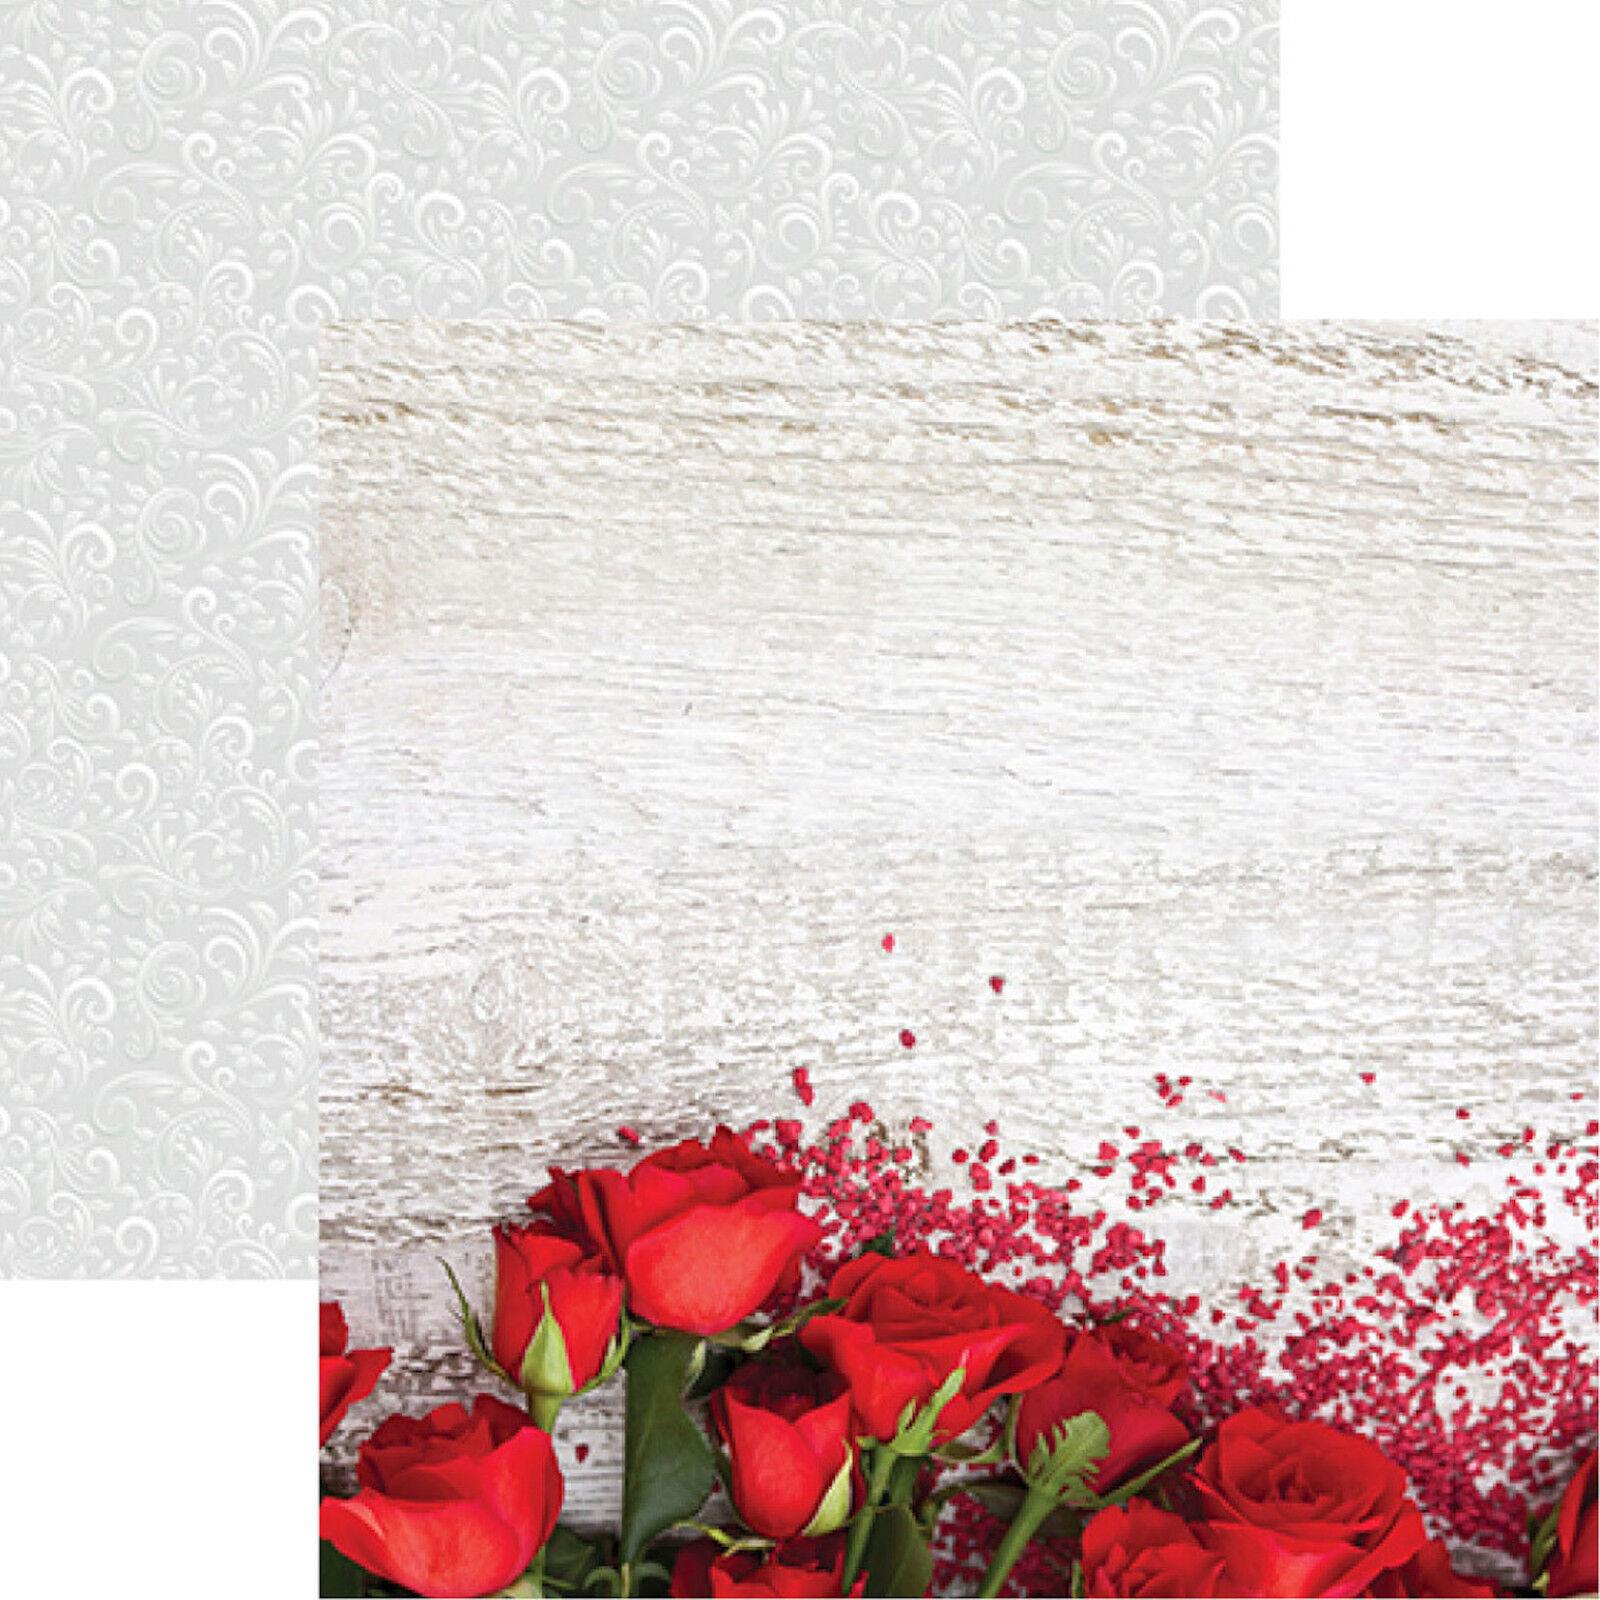 12x12 wedding scrapbook paper - Reminisce Wedding Day Scrapbook Kit 8 12x12 Papers 1 12x12 Sticker Sheet